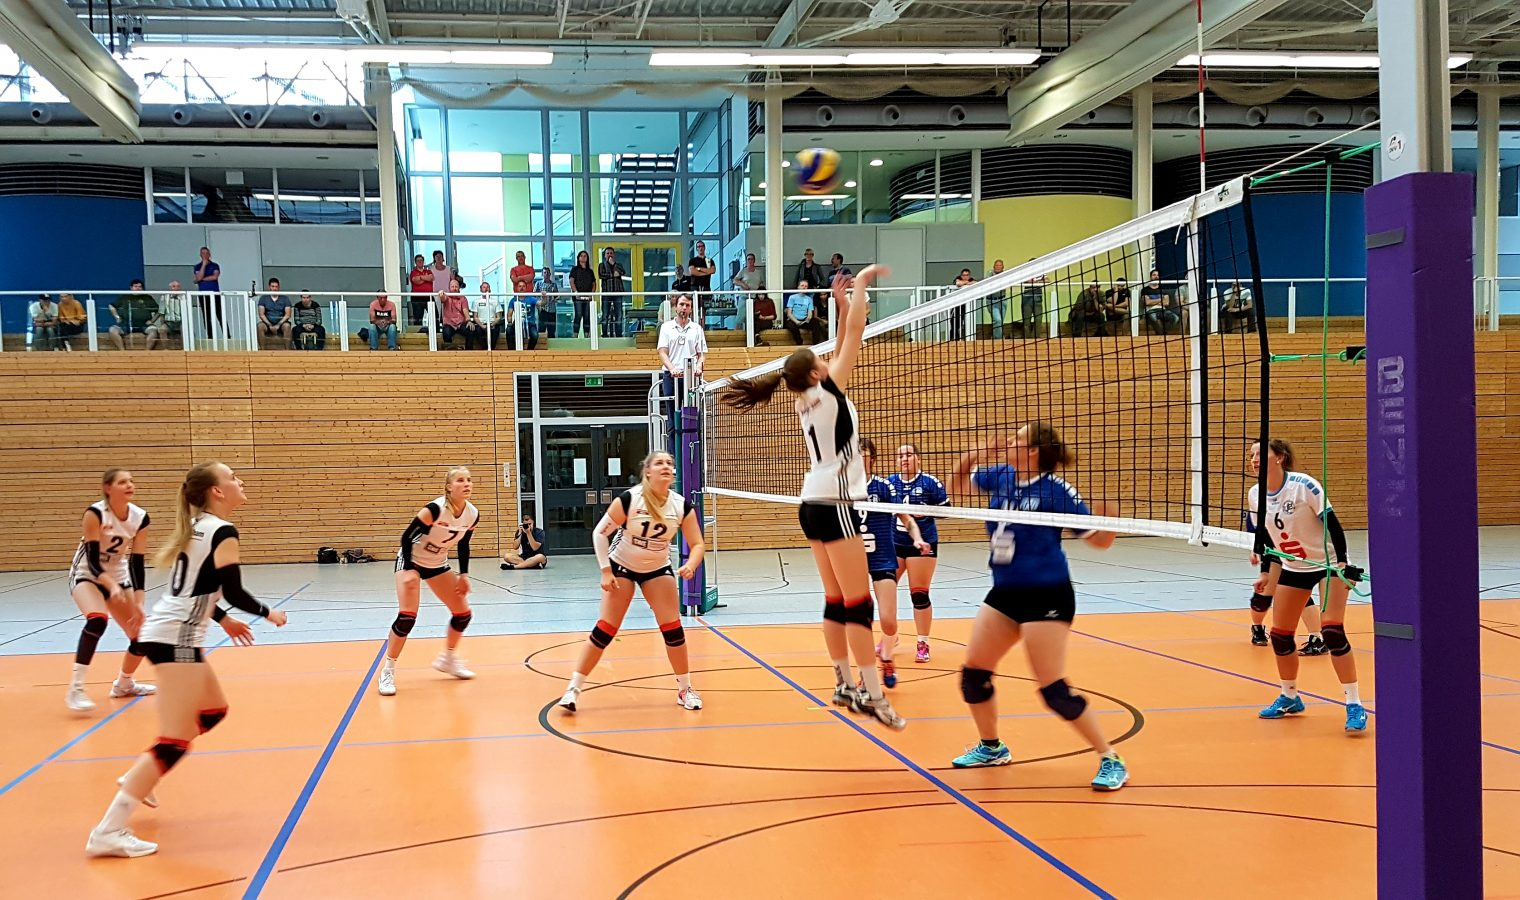 Volleyball Regionalliga Ost: SWE Volley-Team 2 : VfB 91 Suhl 2 (2:3) . Sportgymnasium Erfurt . 15.09.2018 (Foto: Michael Panse)